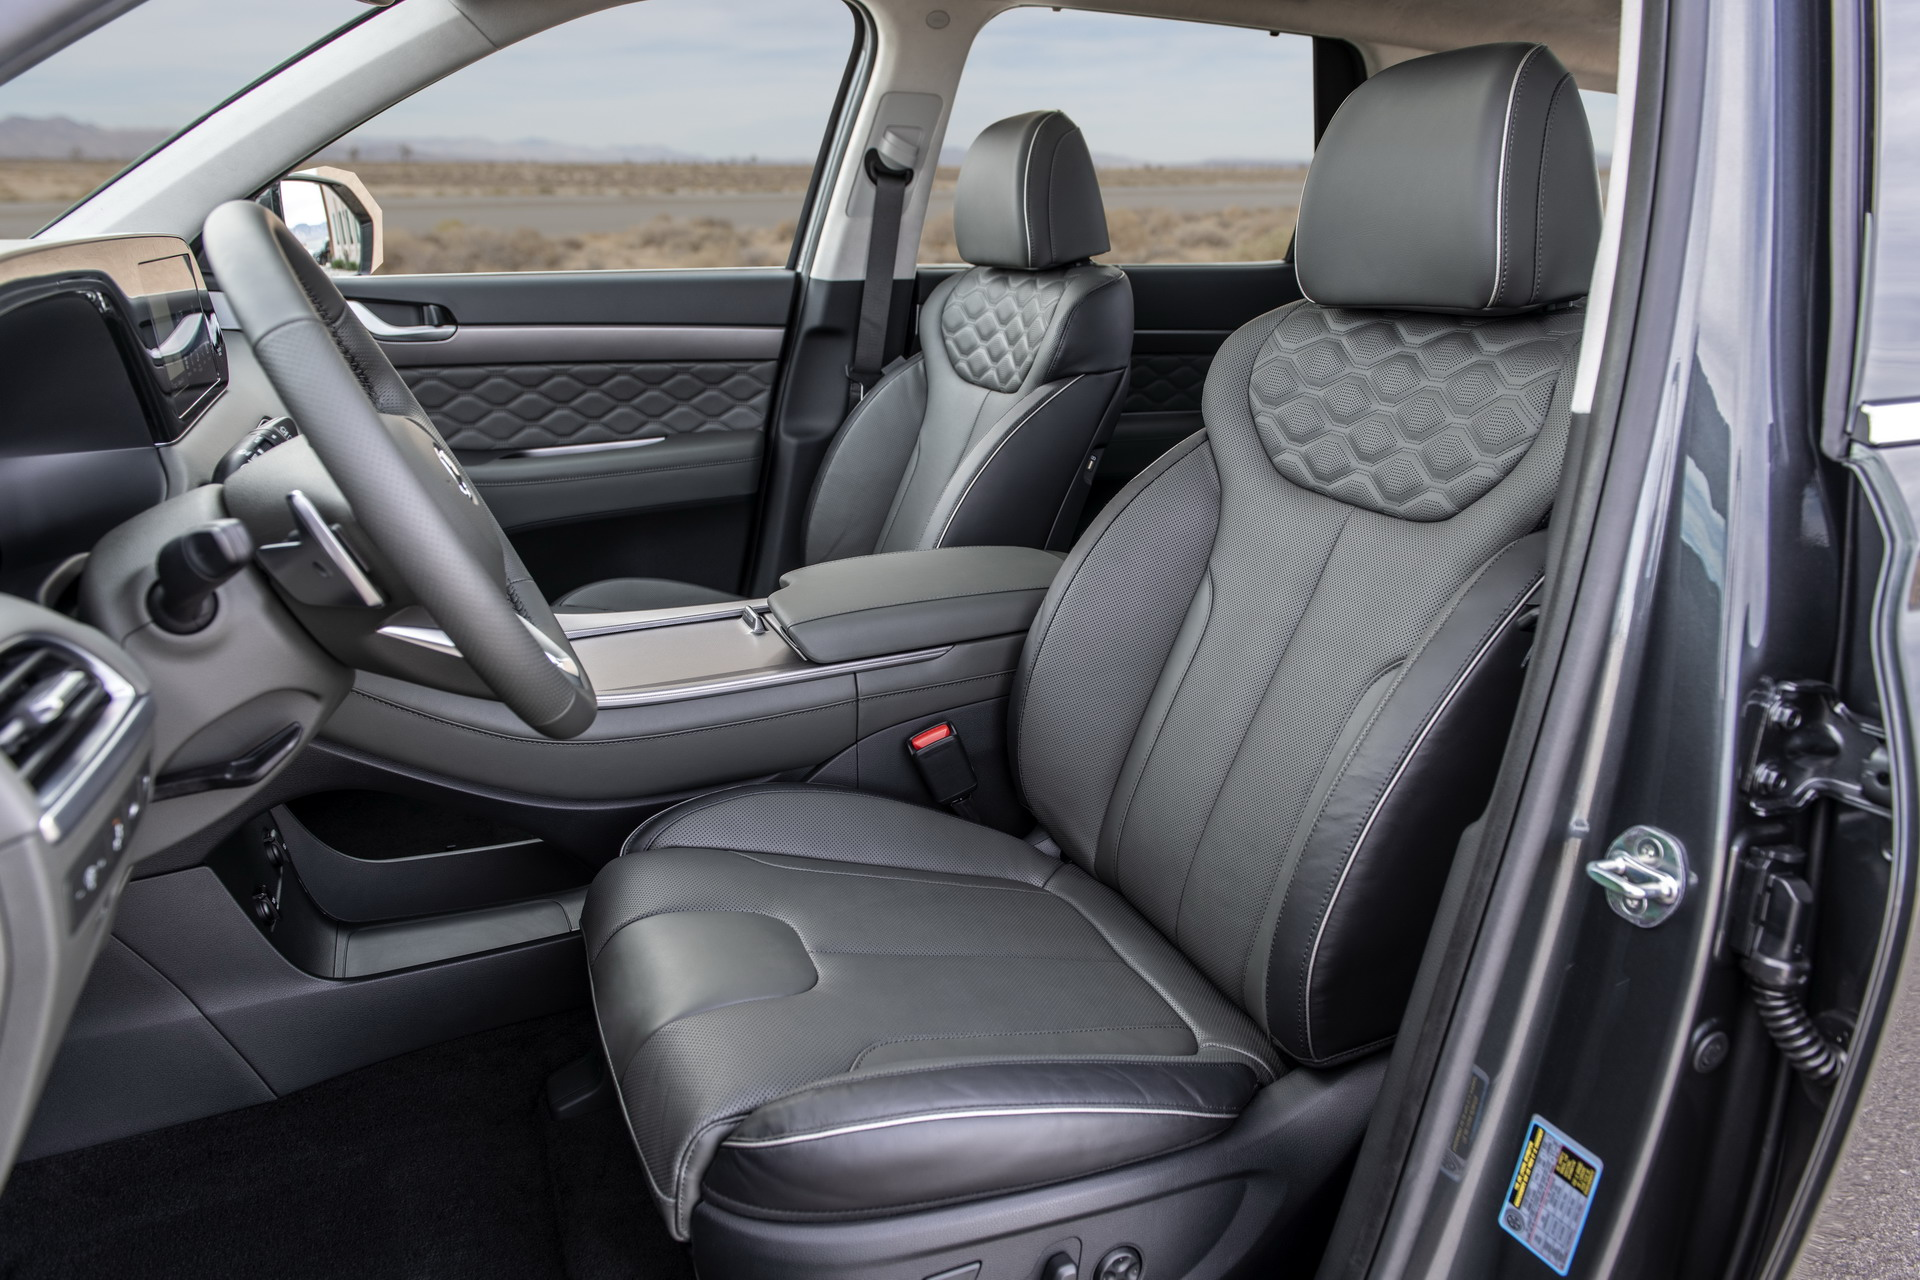 2020 Hyundai palisade leather seats